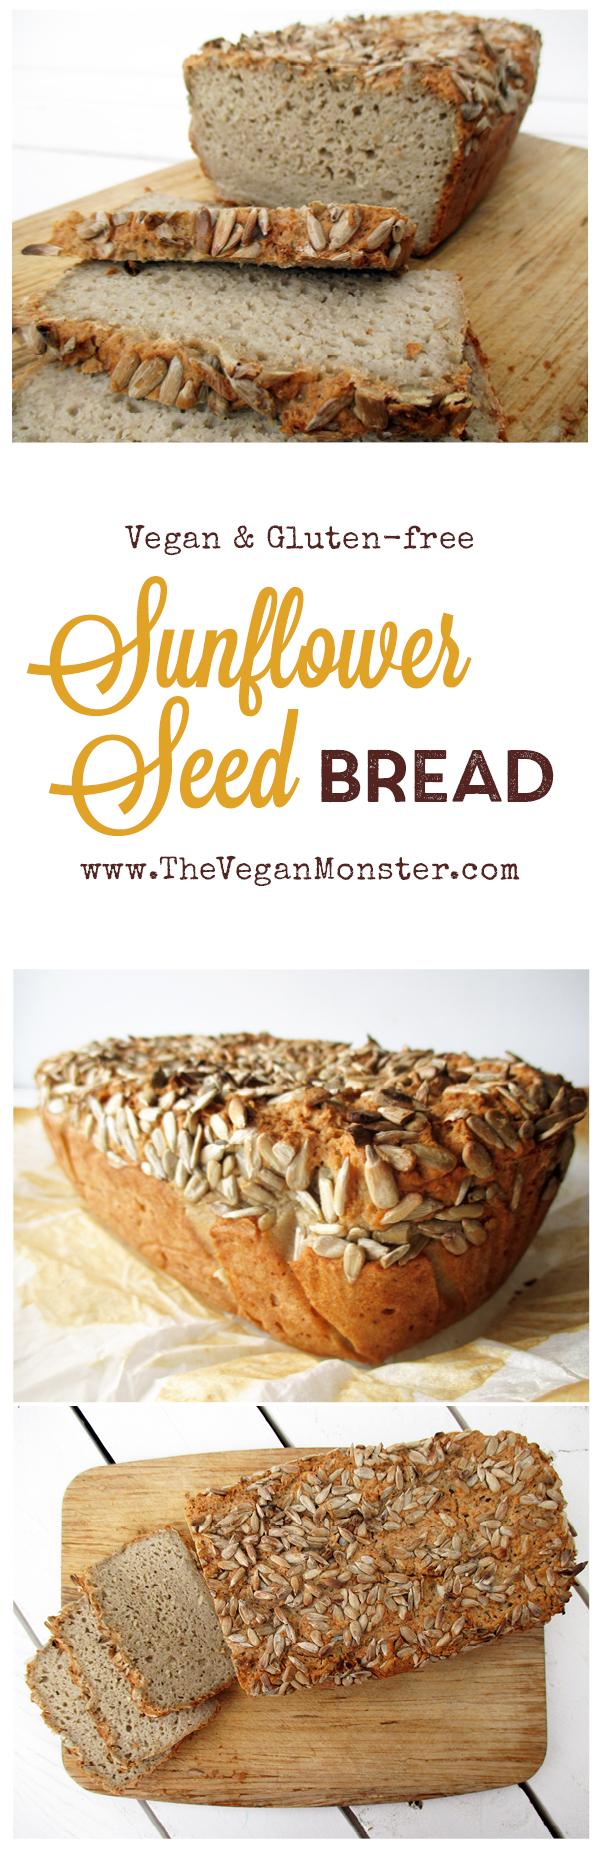 Vegan Gluten-free Dairy-free Egg-free Oil-free Sunflower Seed Bread Recipe